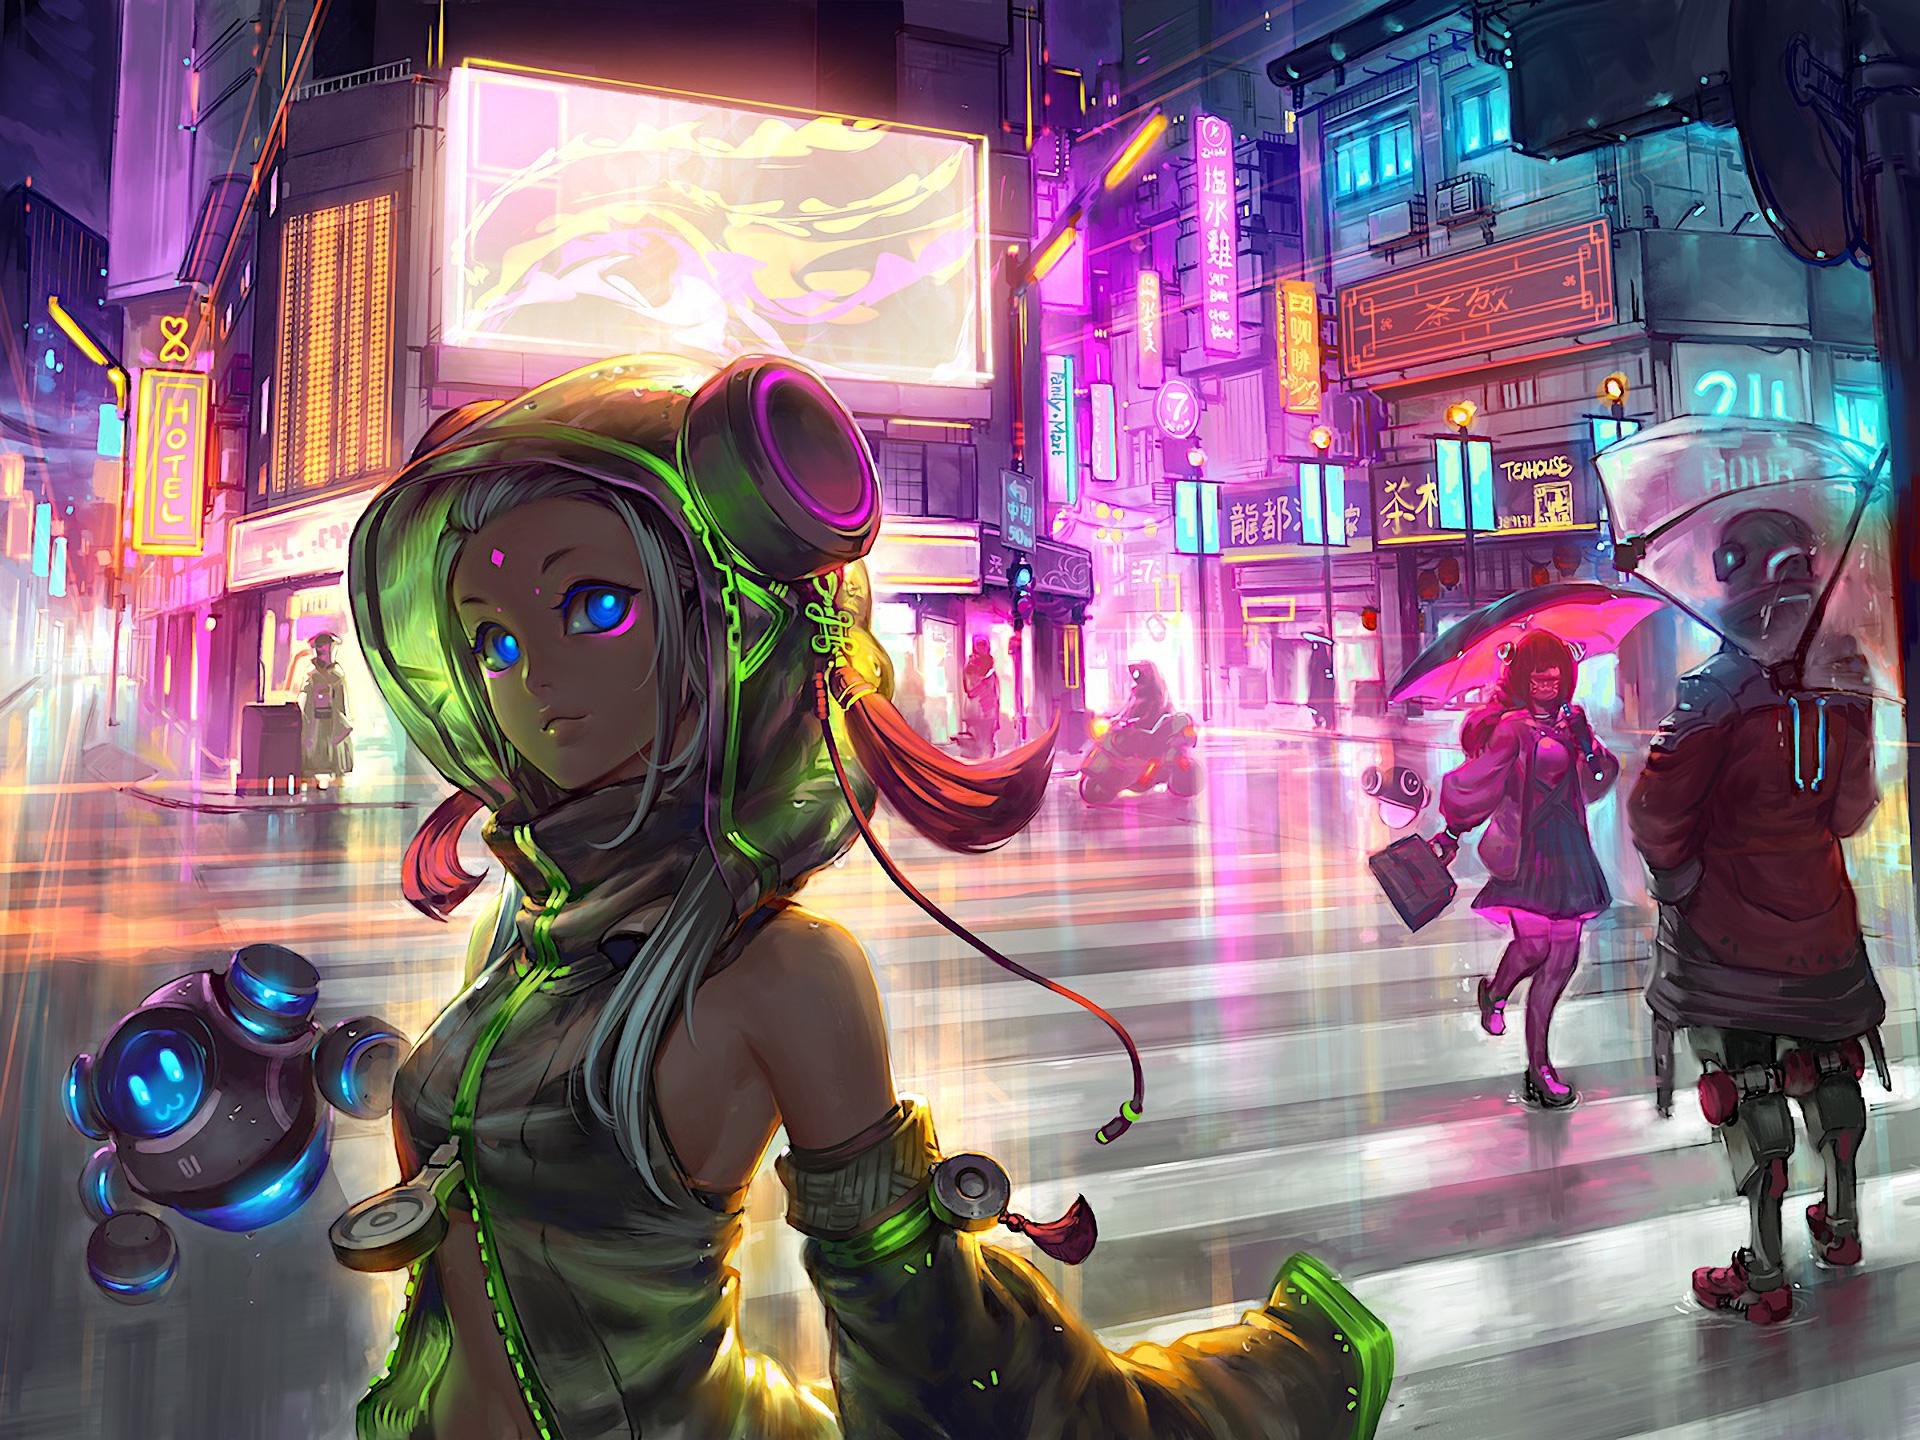 Indian Girl Hd Wallpaper 1920x1080 Anime Cyberpunk Scifi City Hd Anime 4k Wallpapers